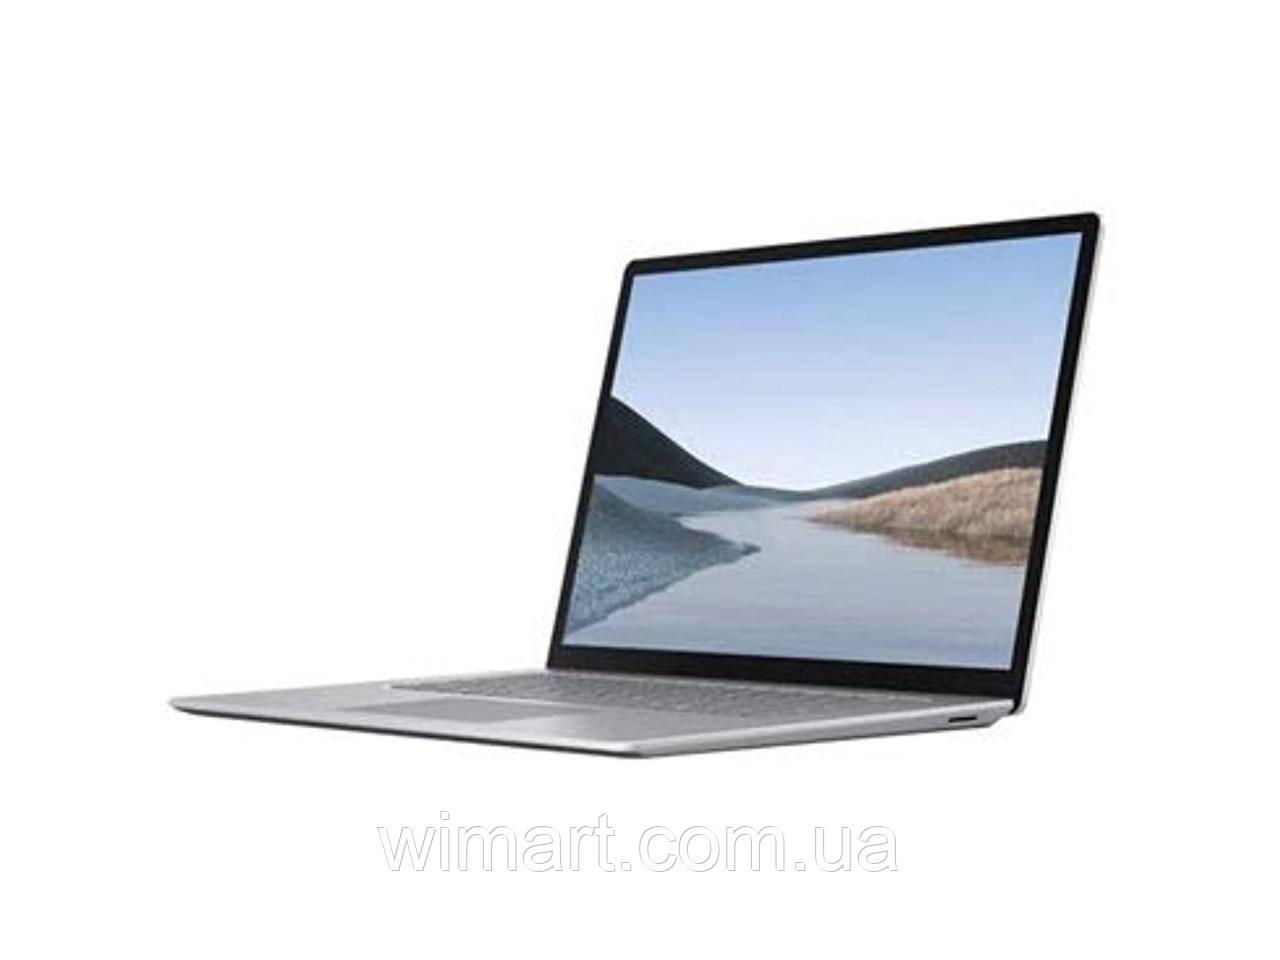 Ноутбук MICROSOFT SURFACE LAPTOP 3 15 AMD RYZEN 5 8|256GB PLATINUM Windows 10 (VGZ-00001)